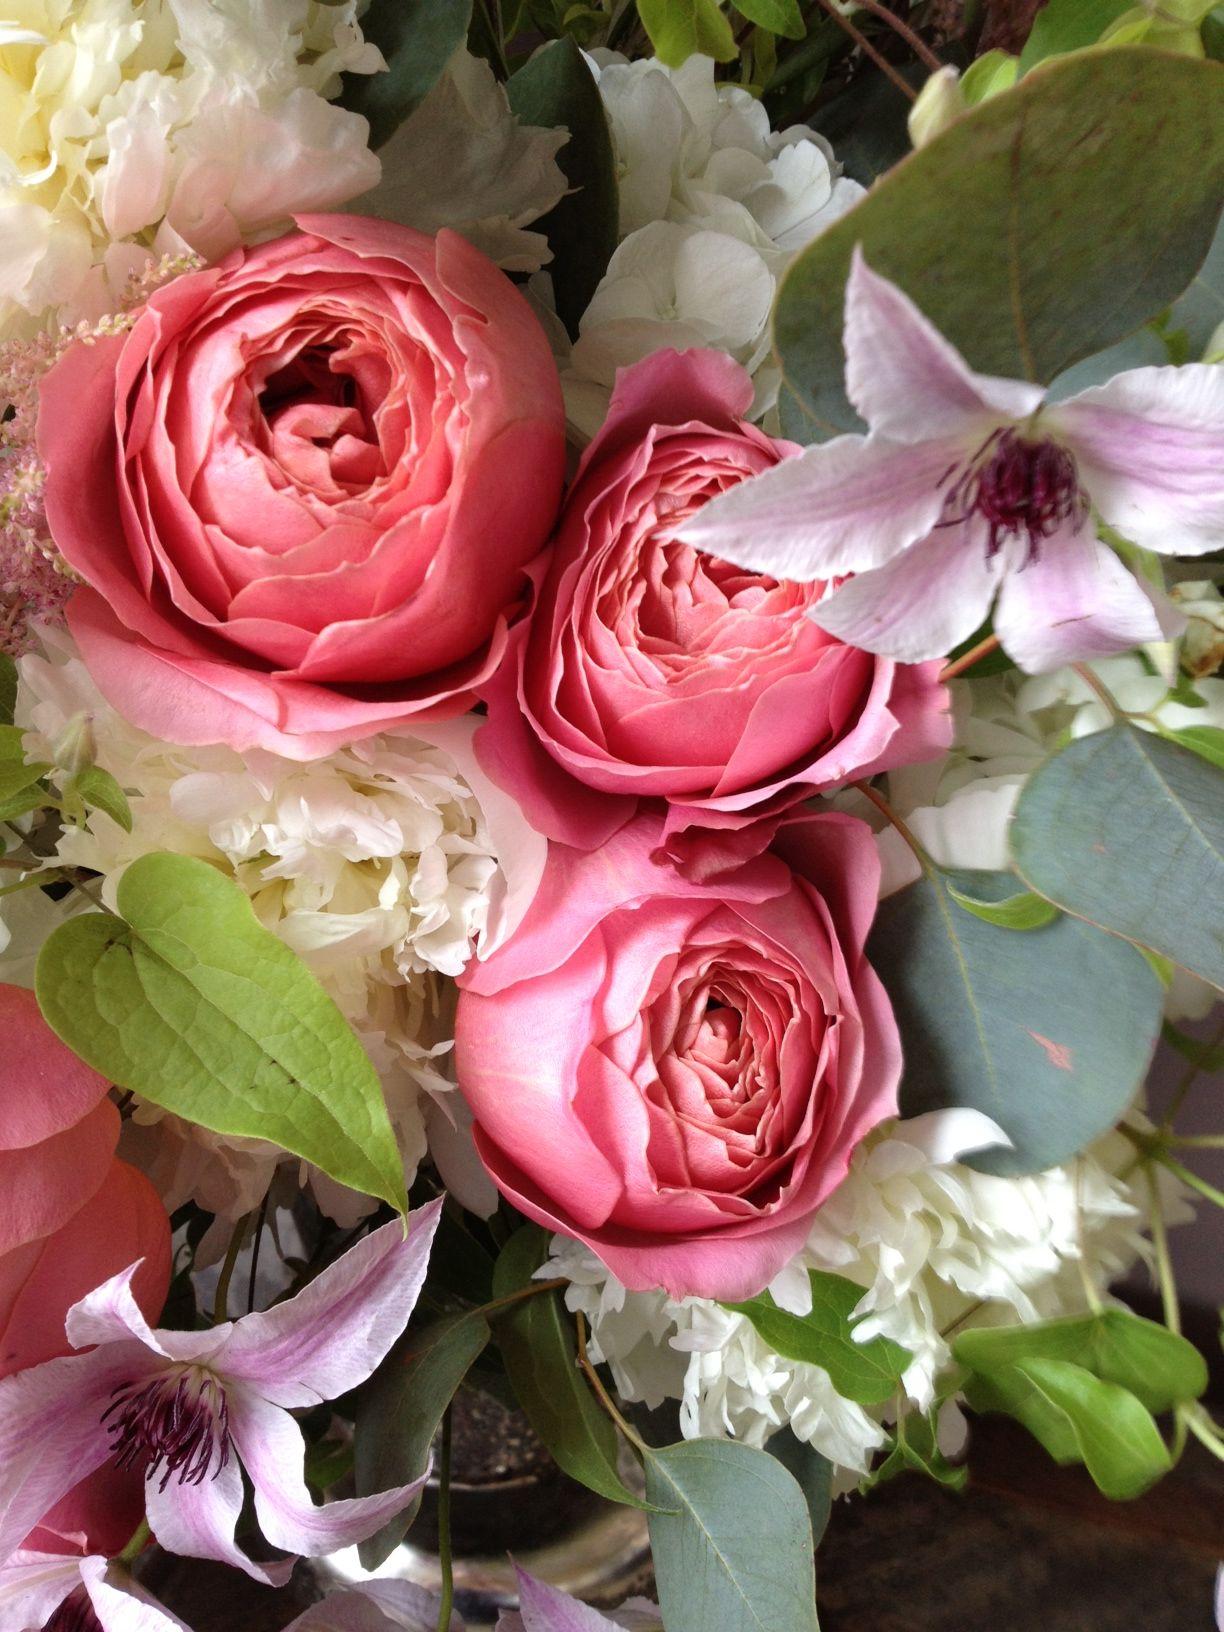 Garden rose & clematis | In Bloom | Pinterest | Clematis, Gardens ...